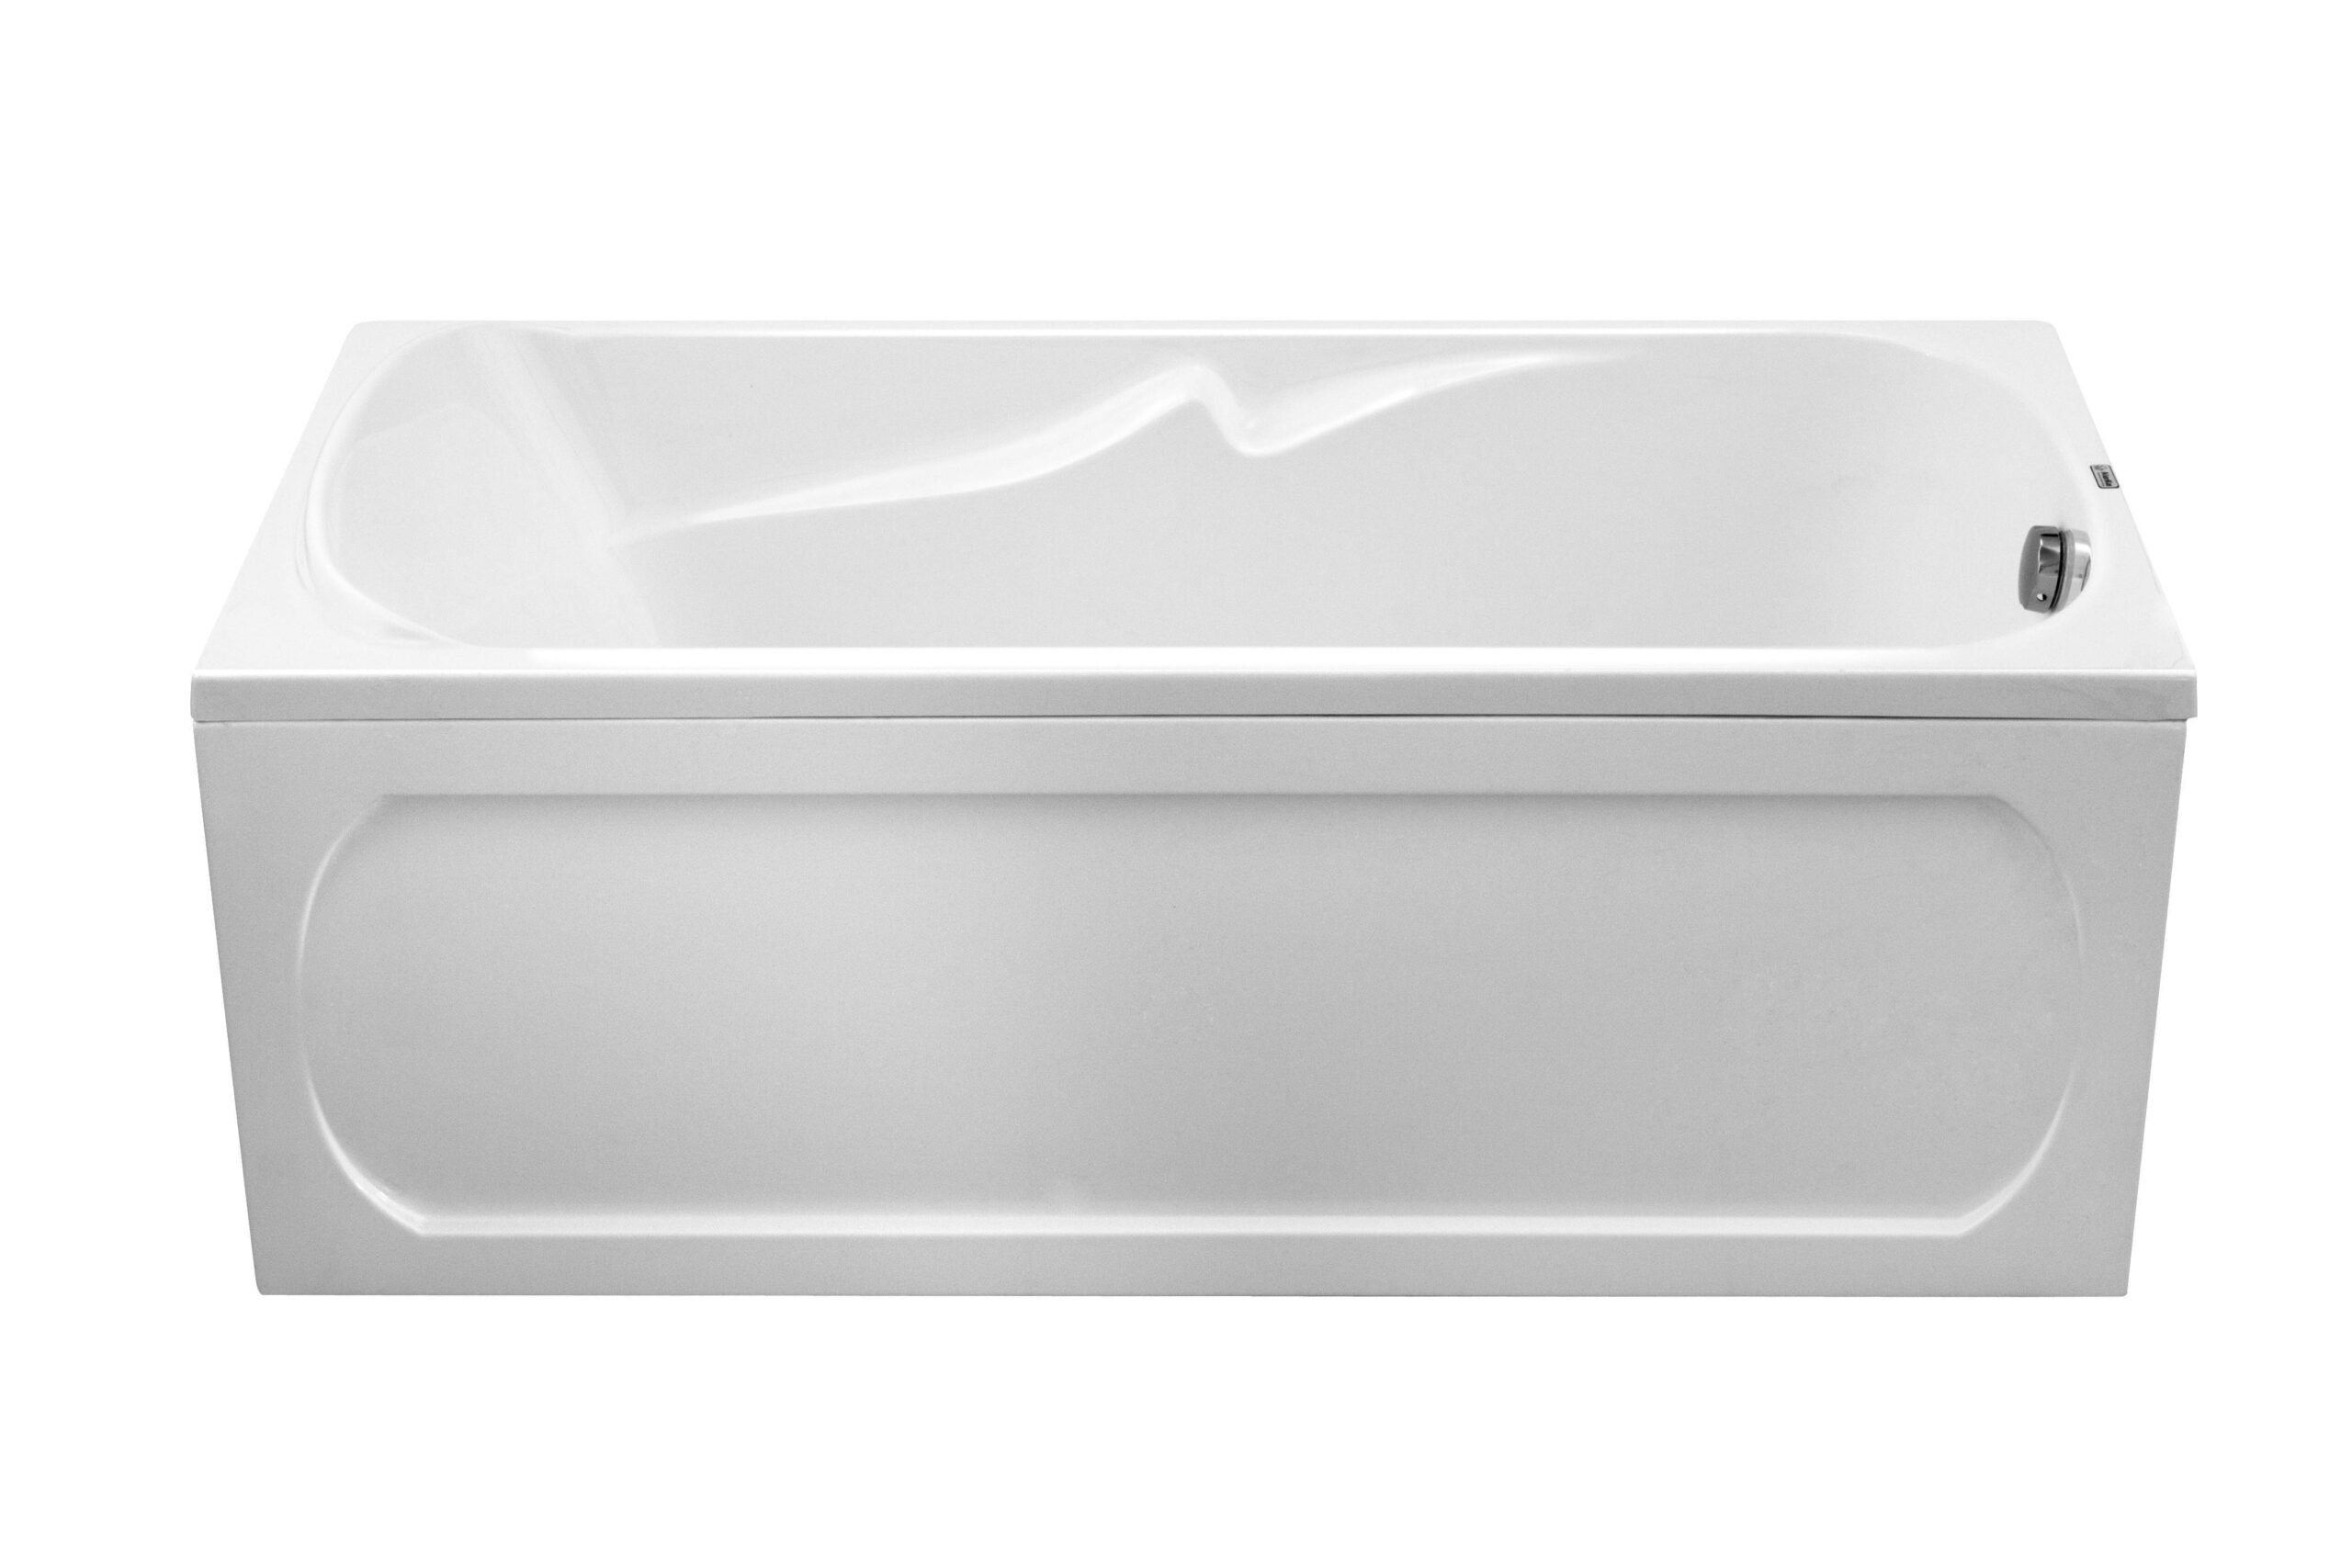 Акриловая ванна MarkaOne Kleo 160*75